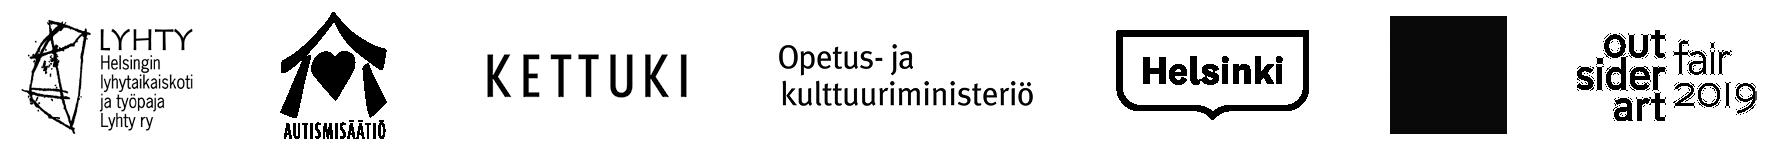 IOF_kumppanilogot_web copy.png